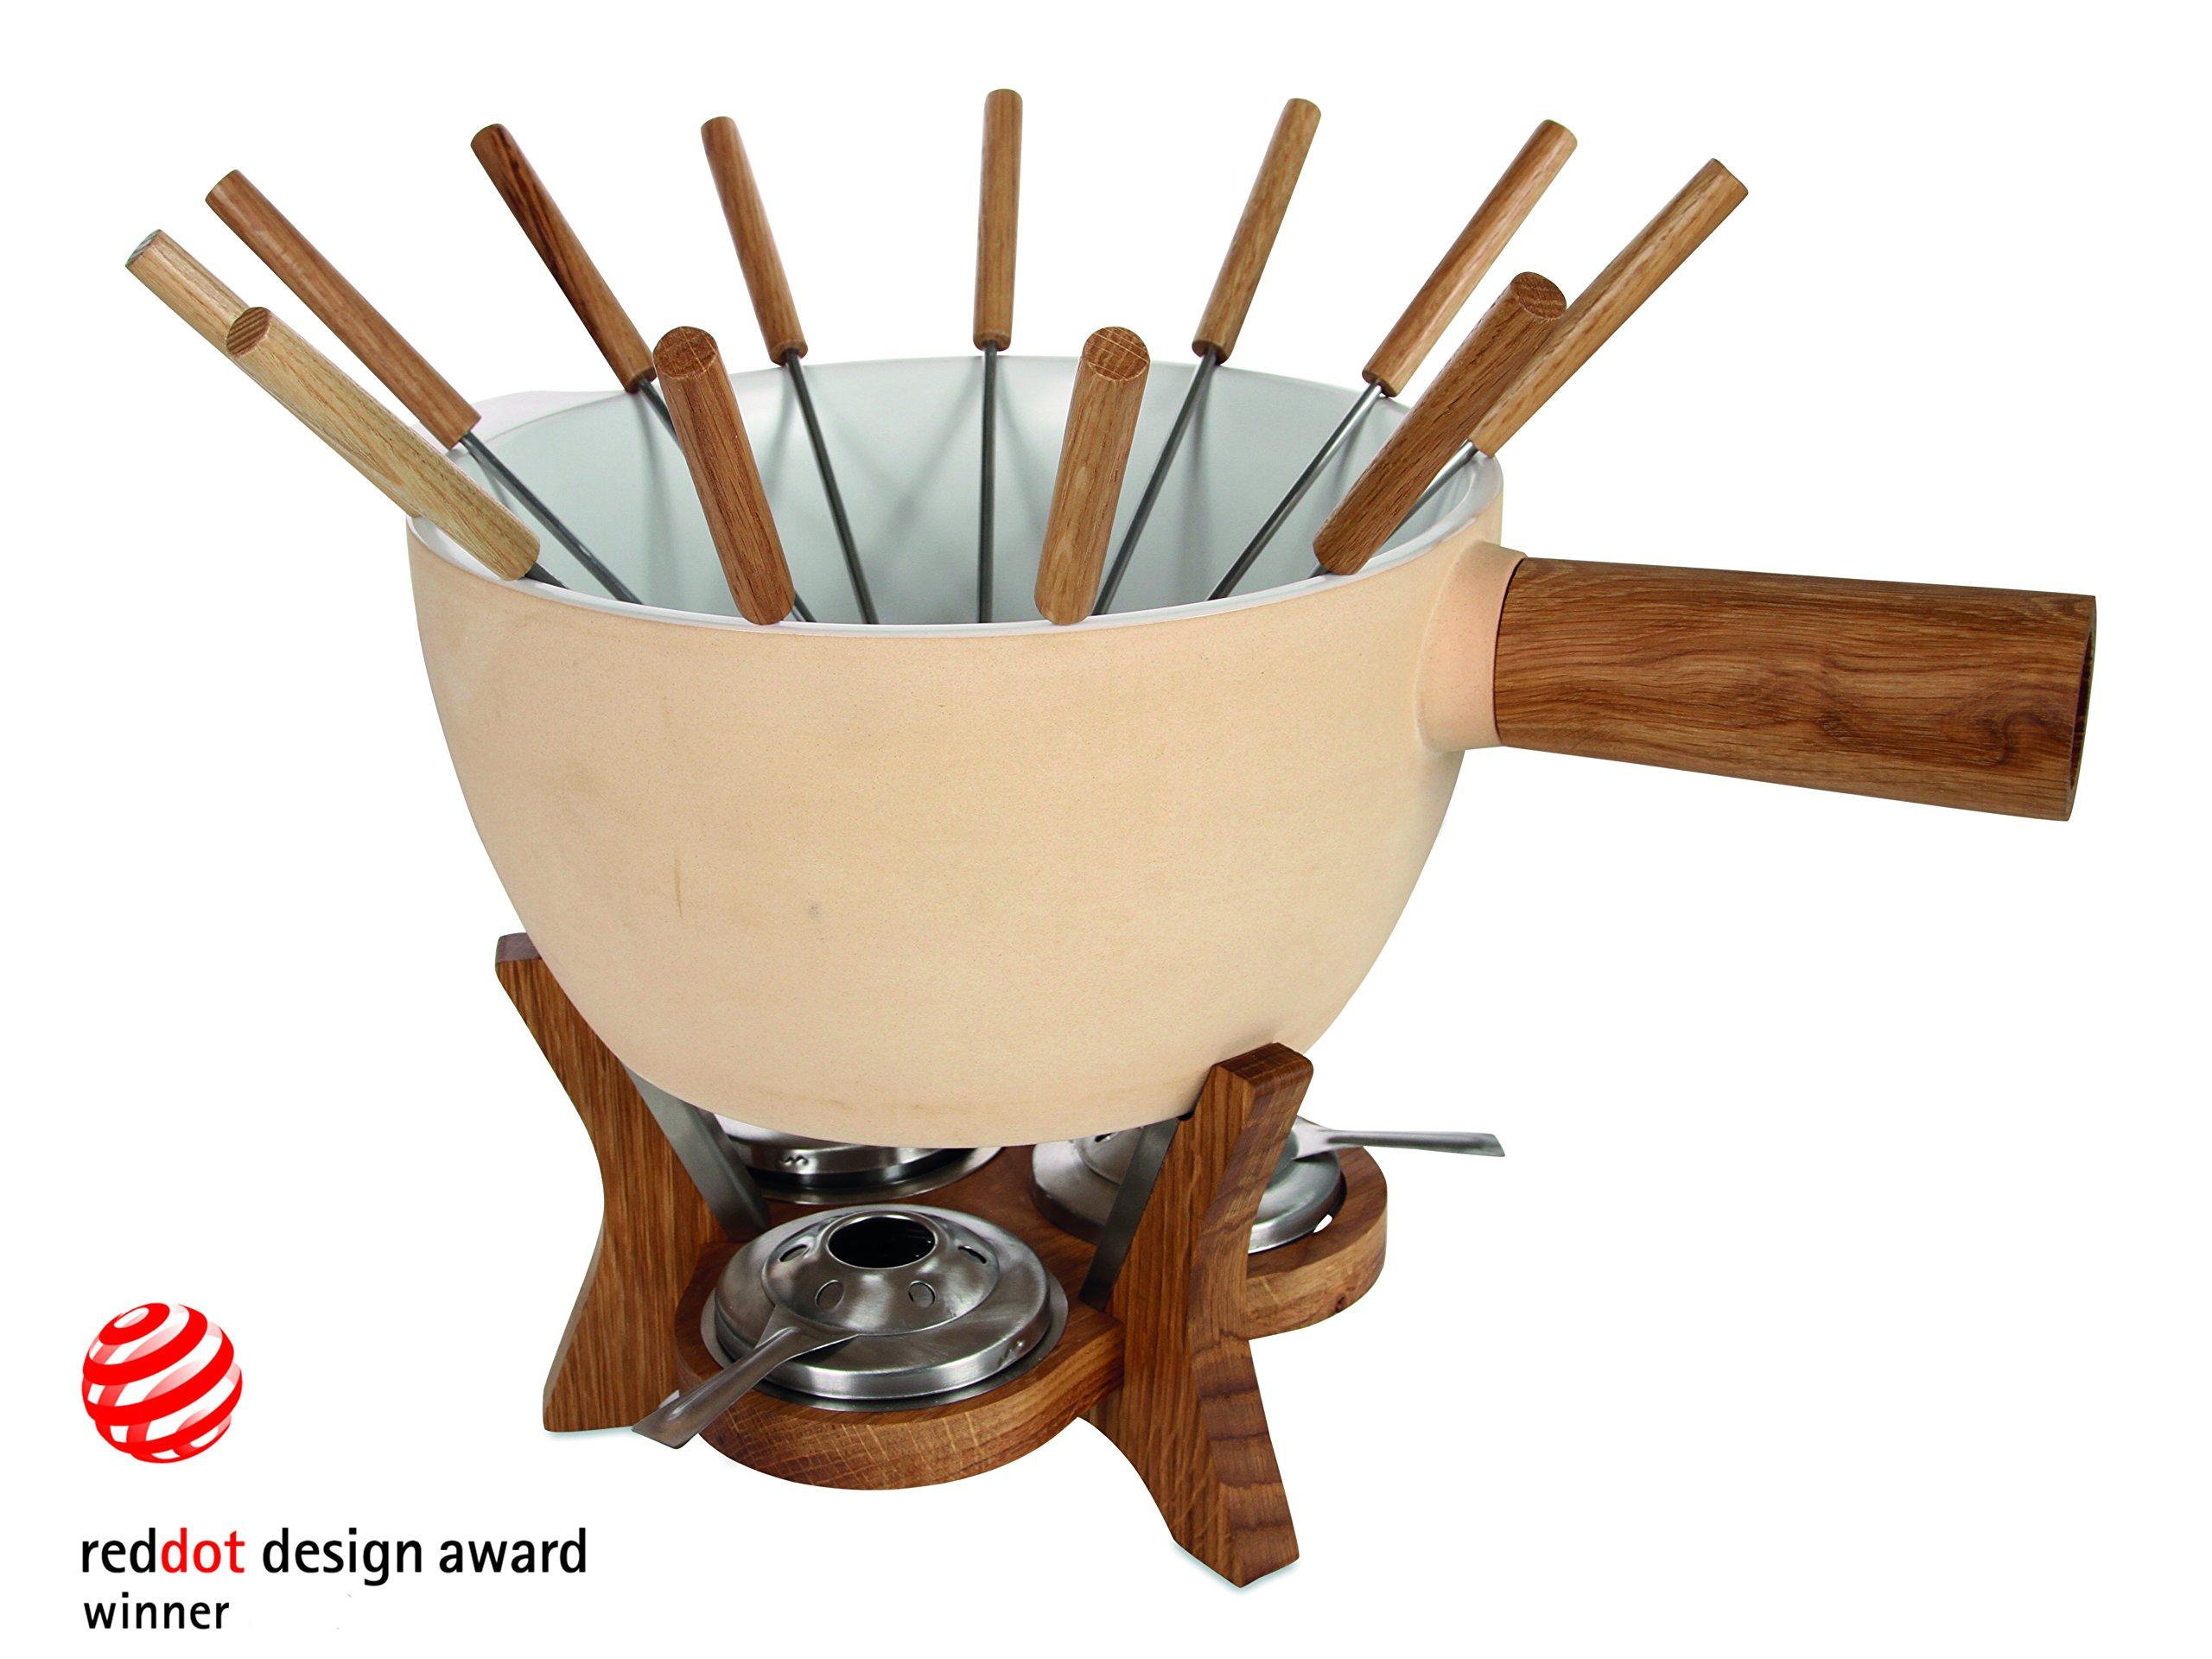 BOSKA Party Fondue Set, 6.5 Liter Stoneware Pot w. Oak Wood Base, 3 Burners, 12 Fondue Forks, Mr Big, Life Collection by Boska Holland (Image #3)